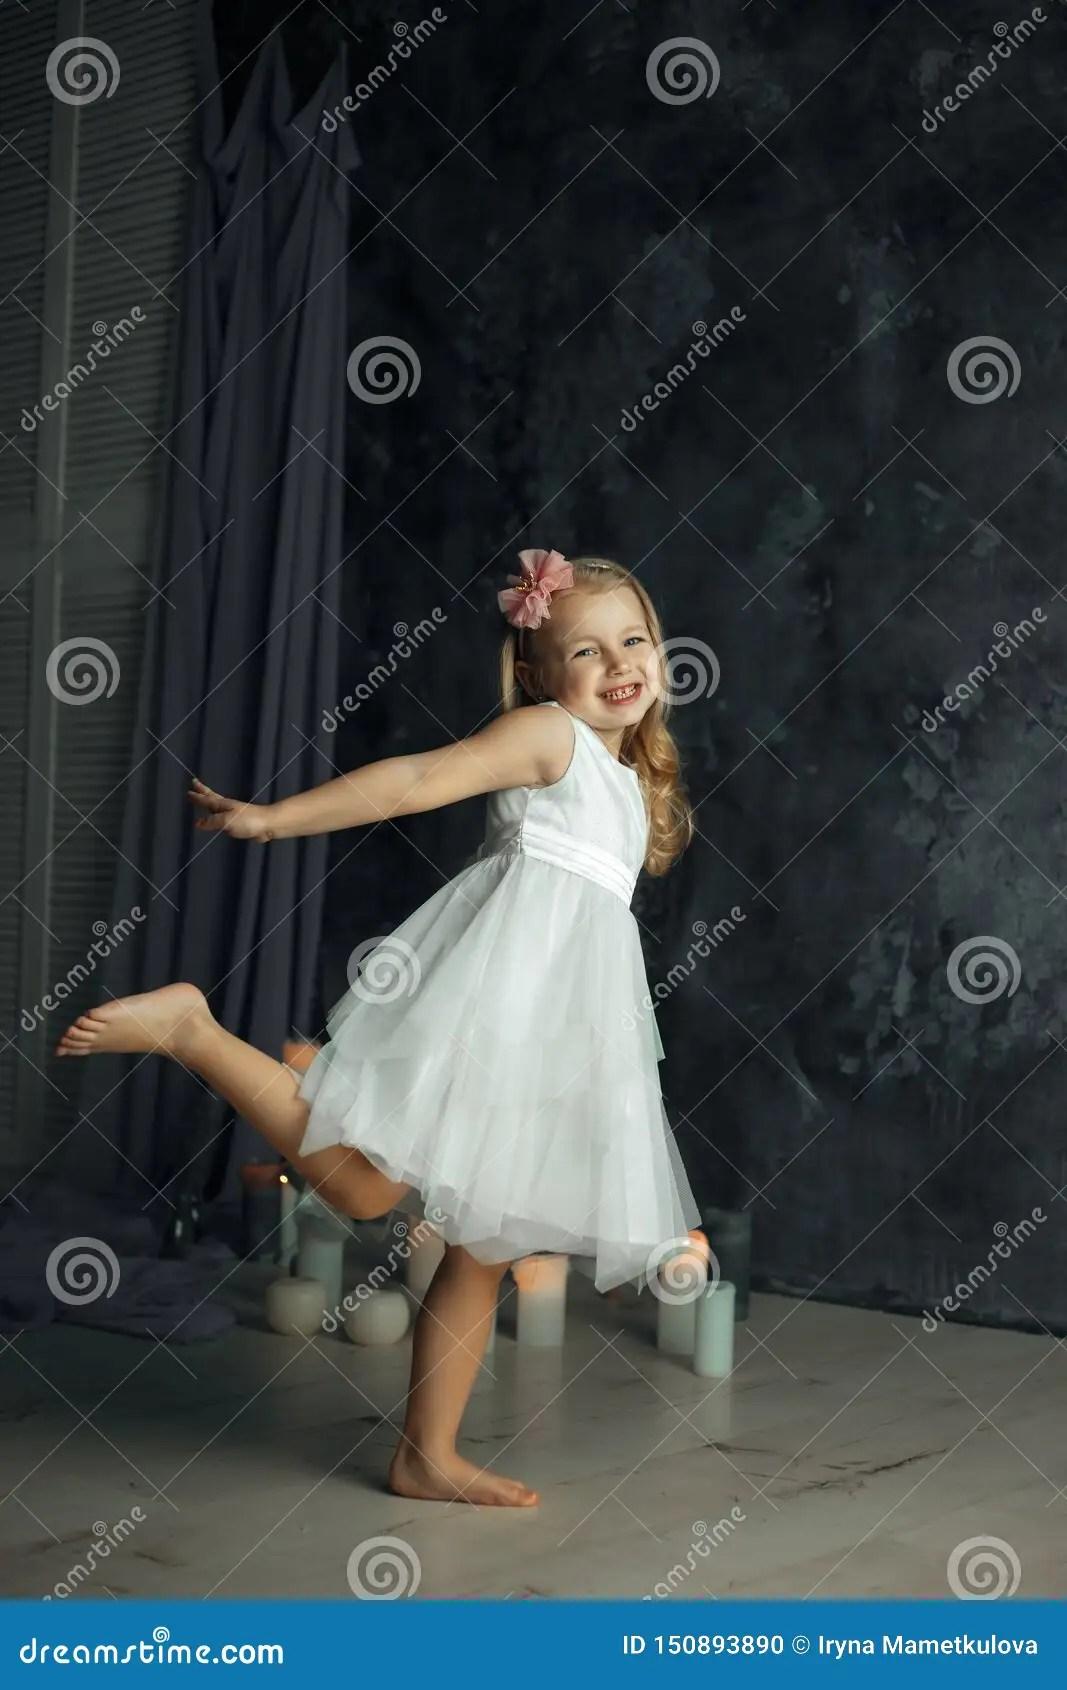 Little Blonde Girl Smiling Listening To Music On Royalty-Free Stock Image   CartoonDealer.com #35697838